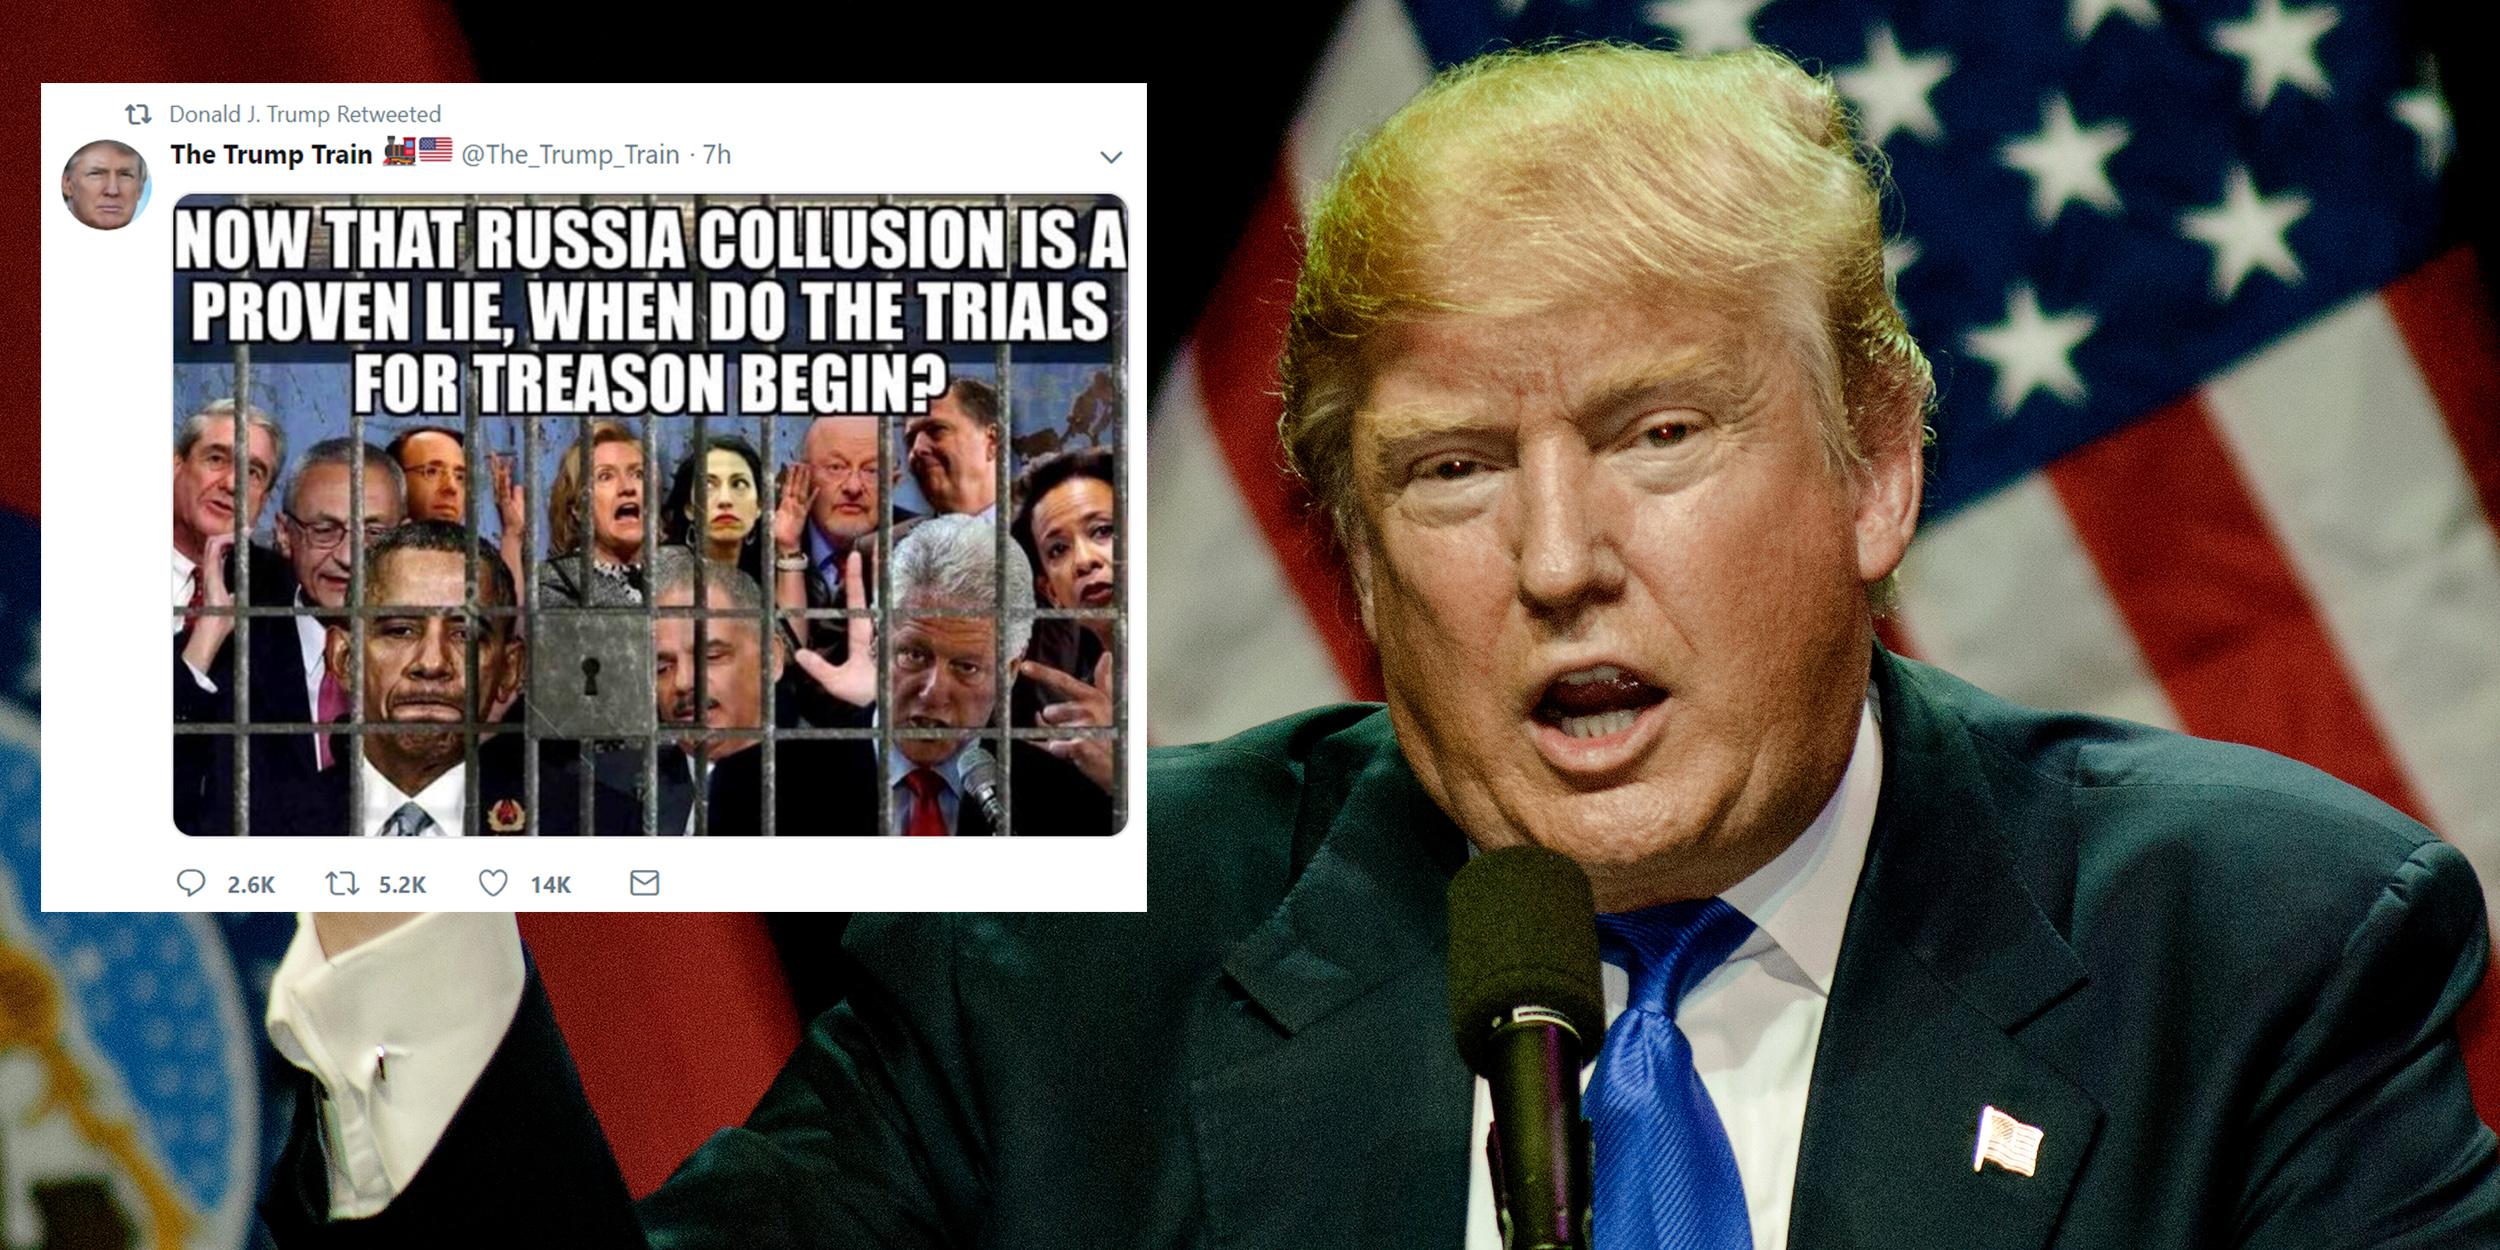 Trump Tweets Image Showing Prominenent Democrats Behind Bars